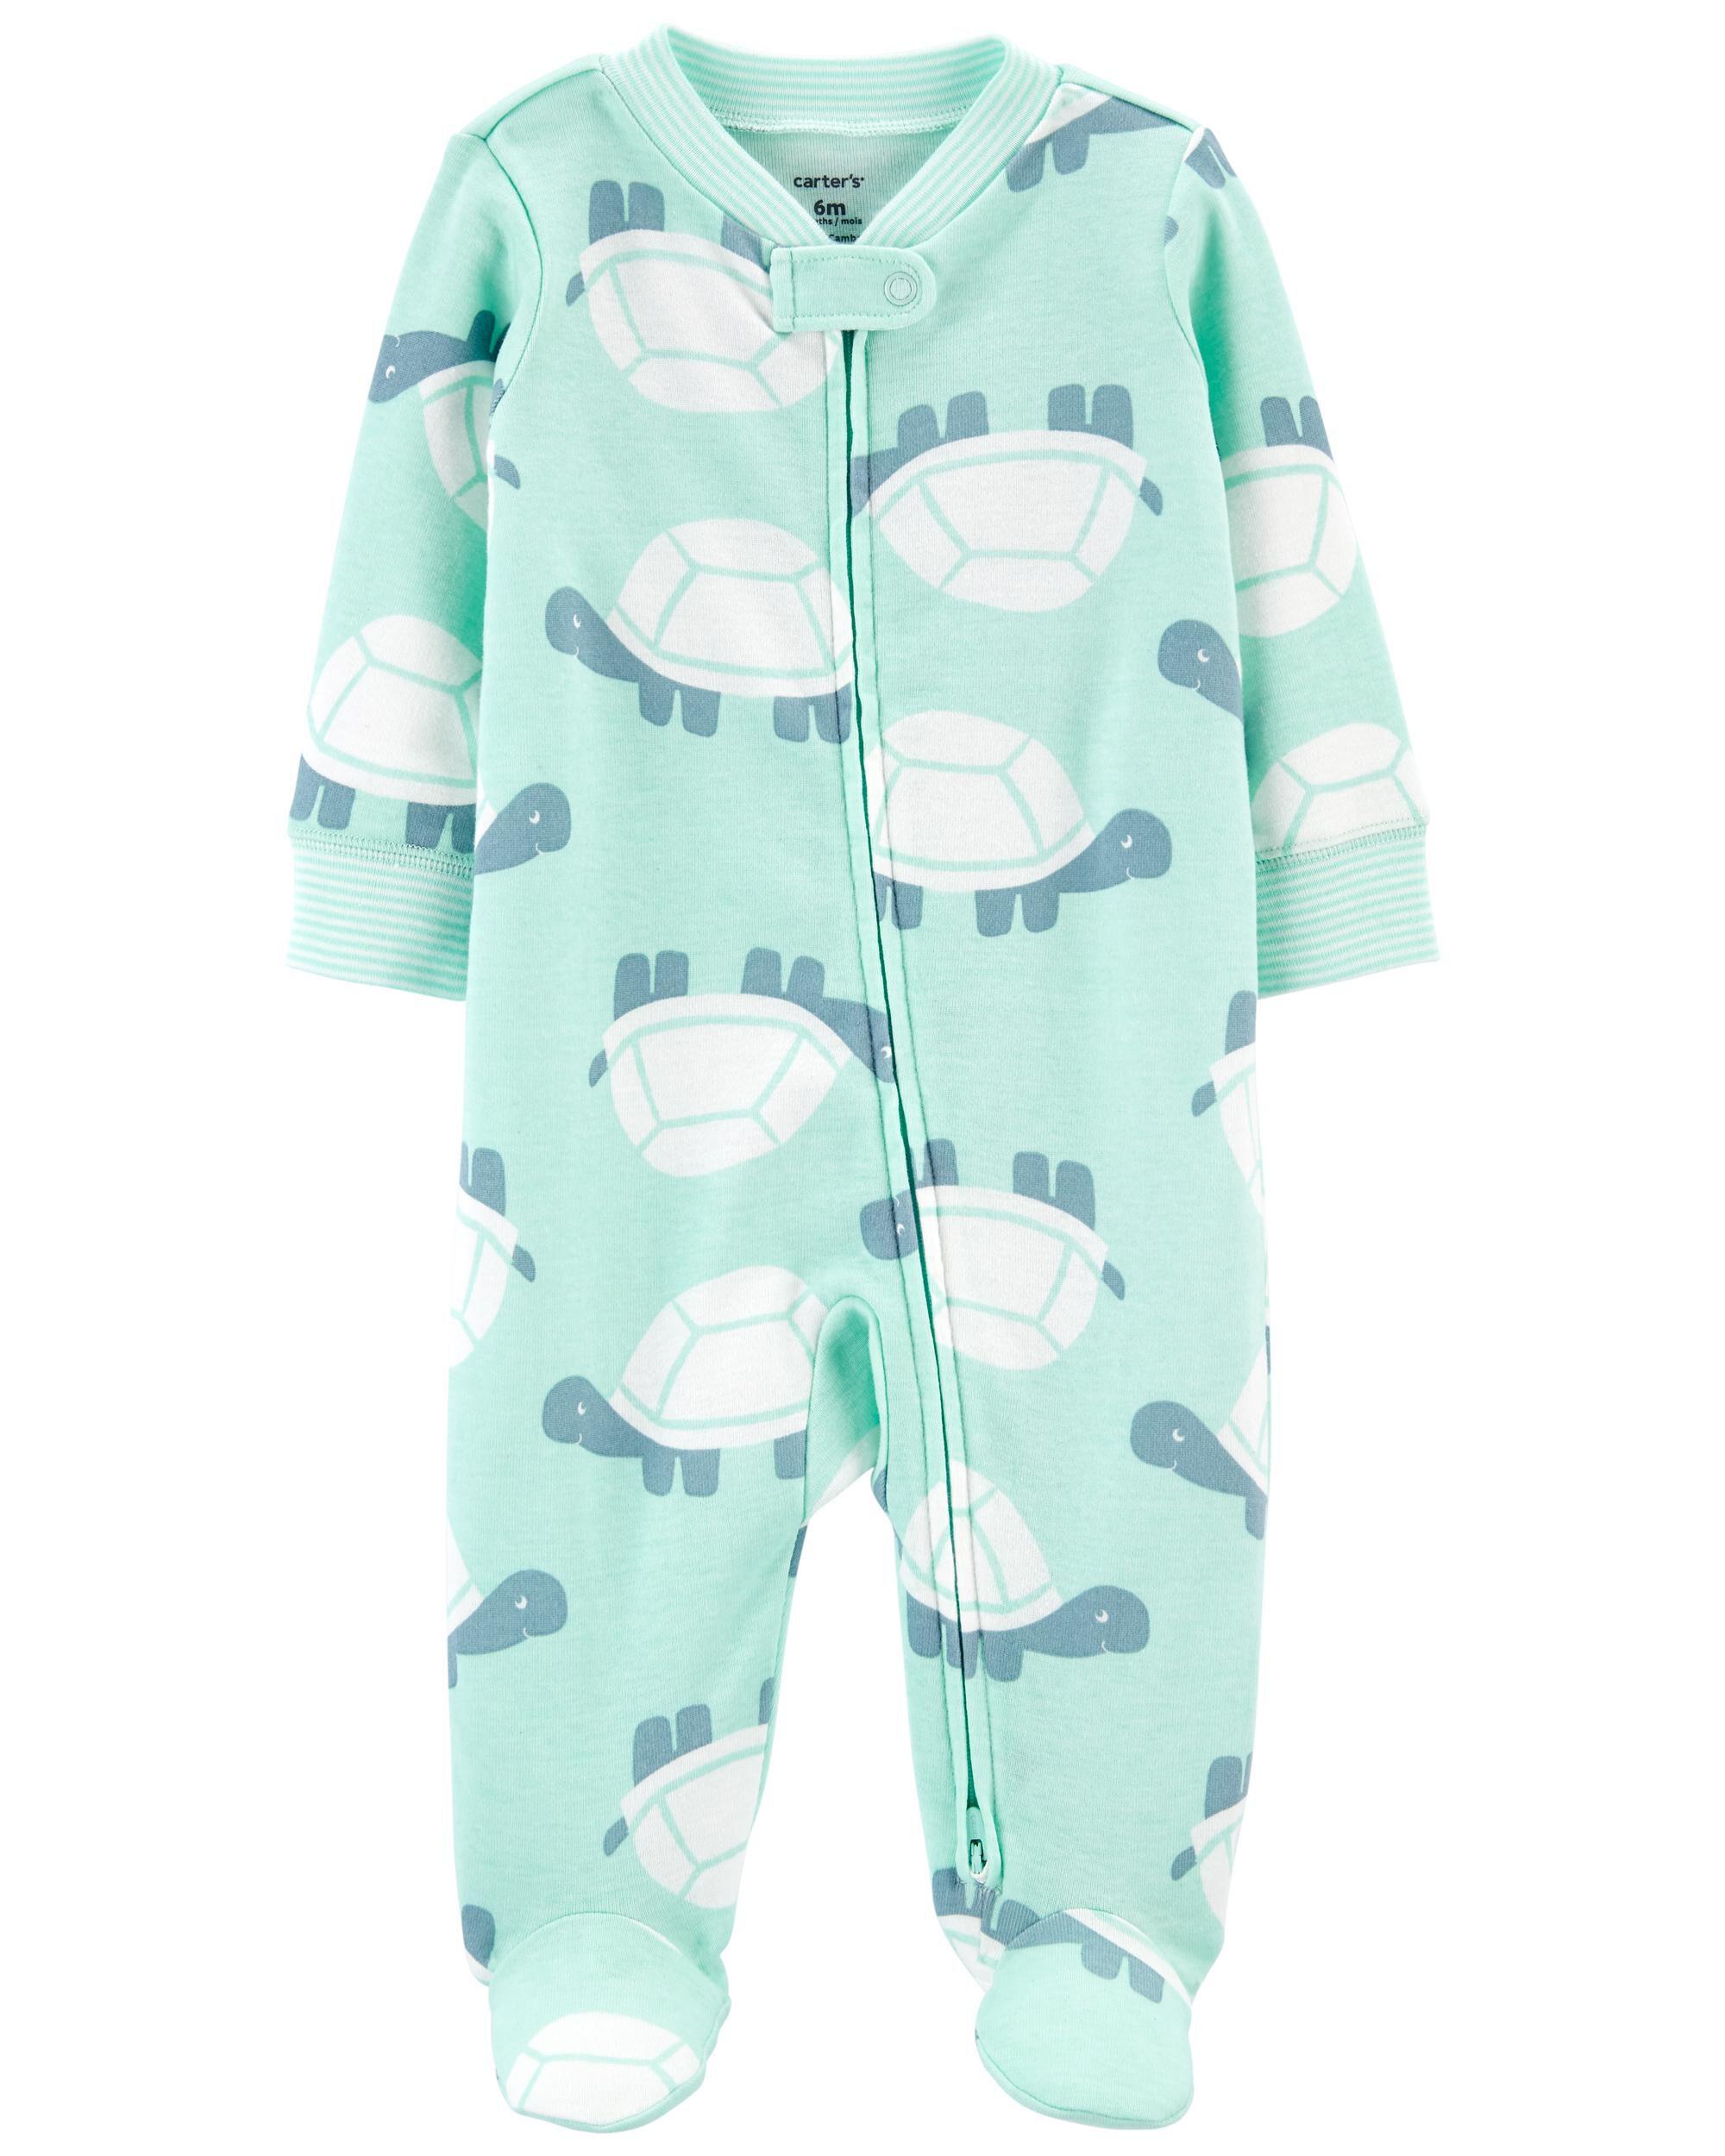 Turtle 2-Way Zip Cotton Sleep & Play